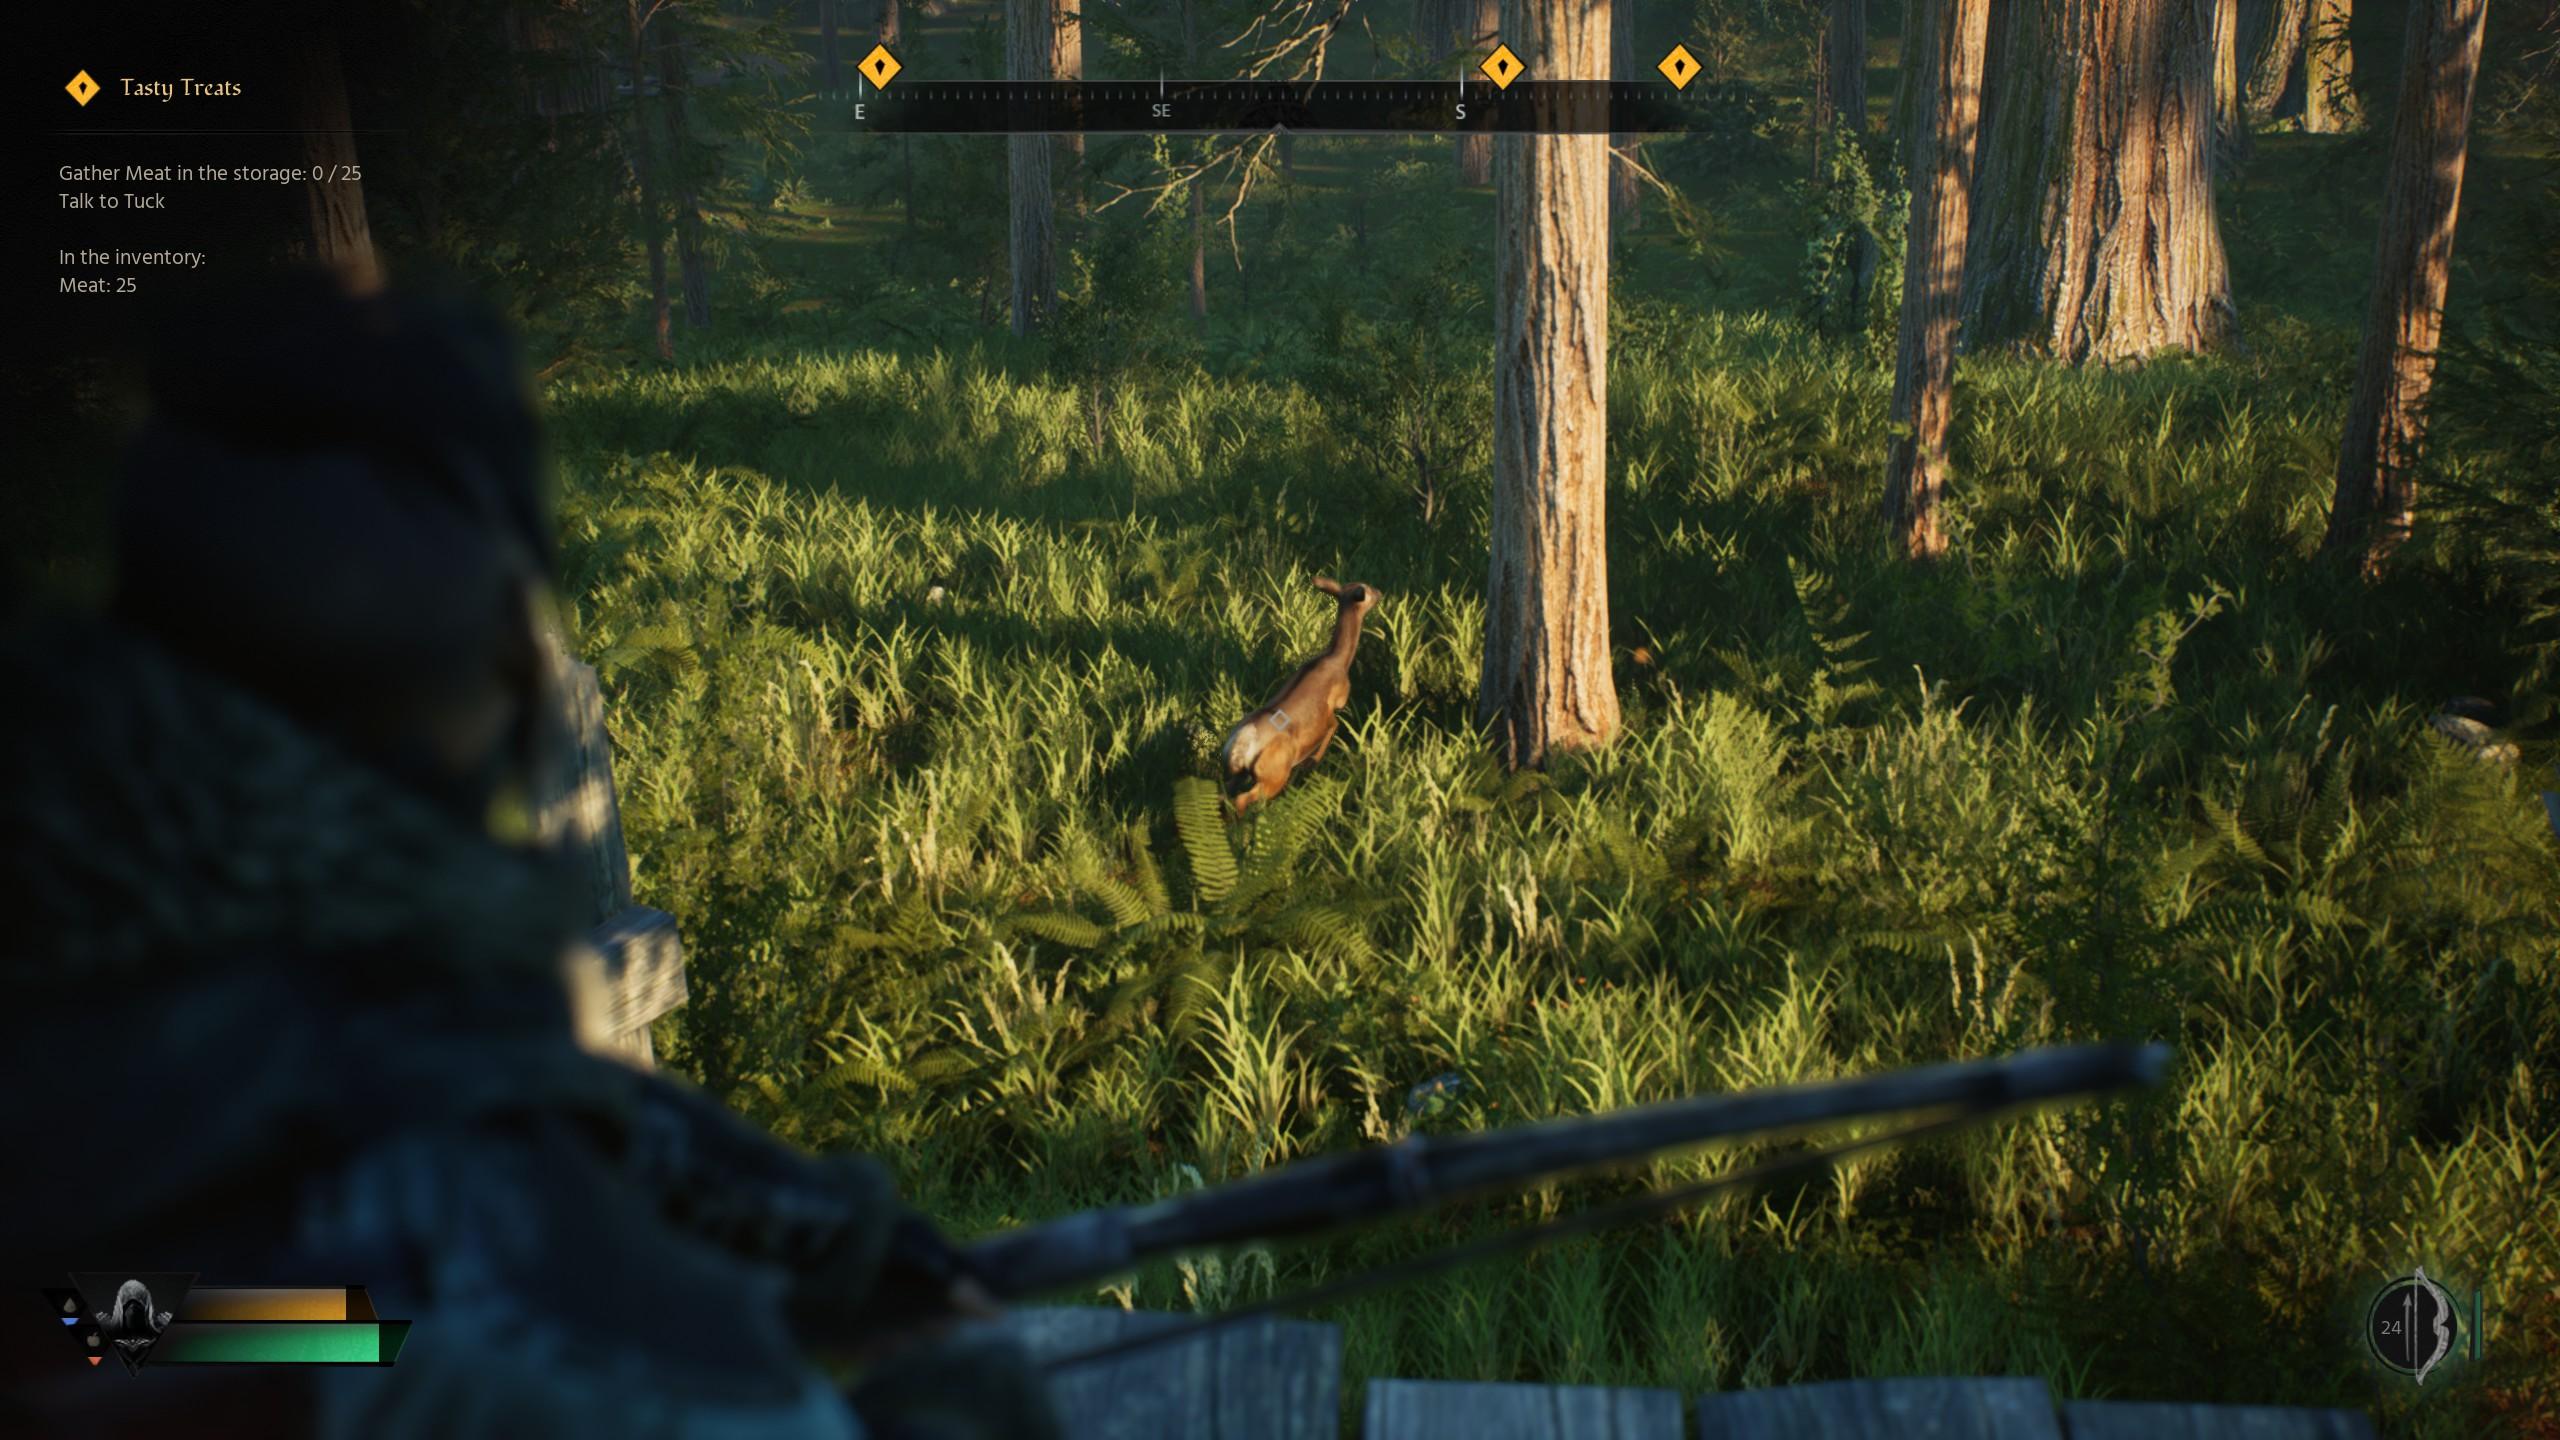 Robin Hood - Sherwood Builders Playtest - Tips on How to Hunt Deer for Meat in Game - Huntspot - Chaffinch's Nest - 5DF2577